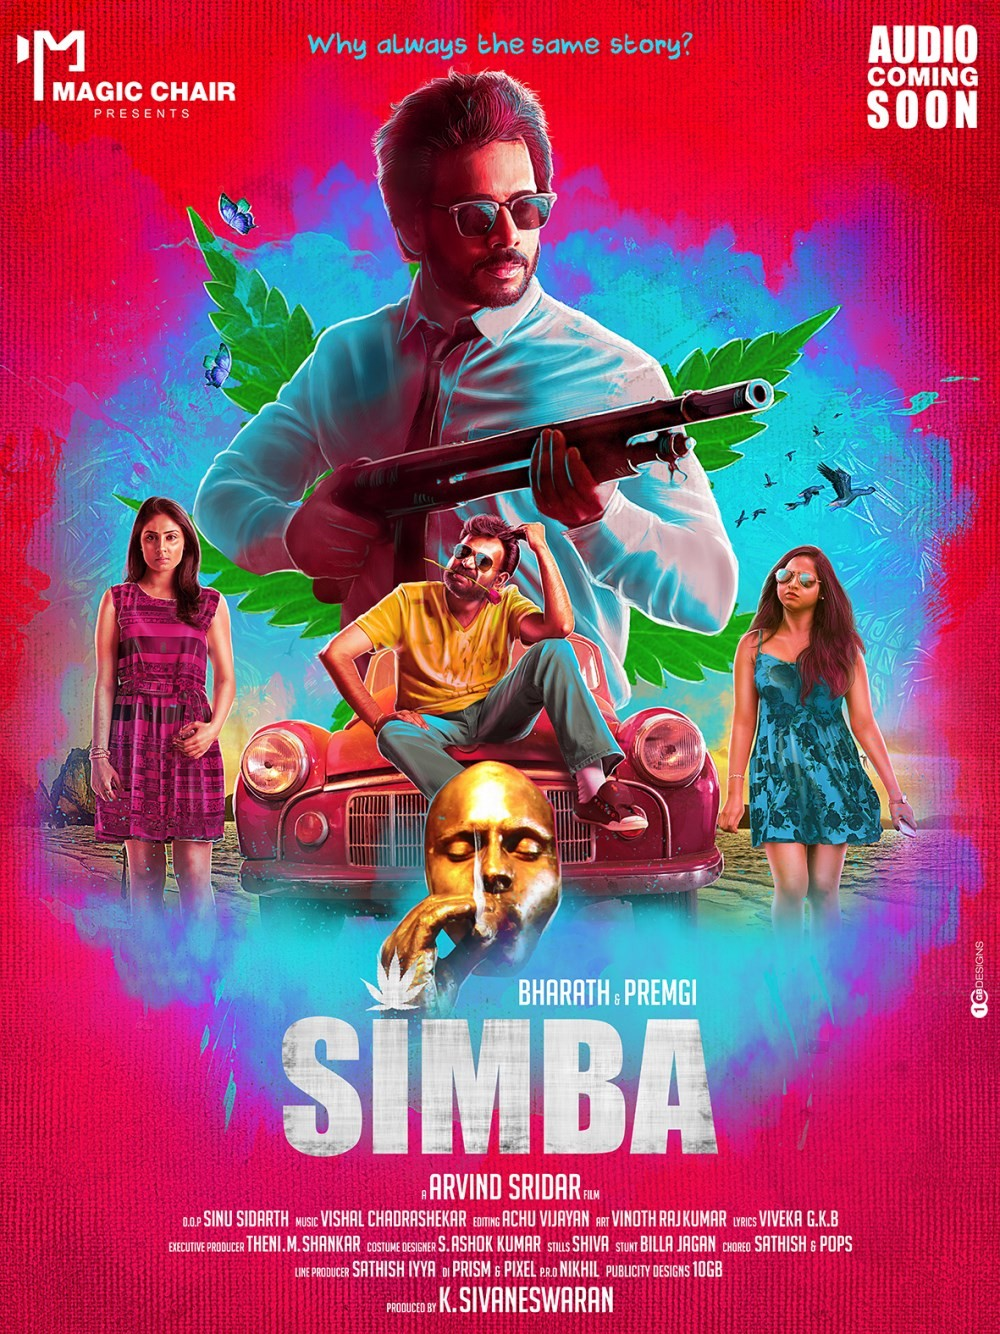 Simba,Simba first look,Simba first look posters,Simba posters,Bharath,Premgi Amaran,Bharath Simba,tamil movie Simba,Simba movie stills,Simba movie pics,Simba movie images,Simba movie photos